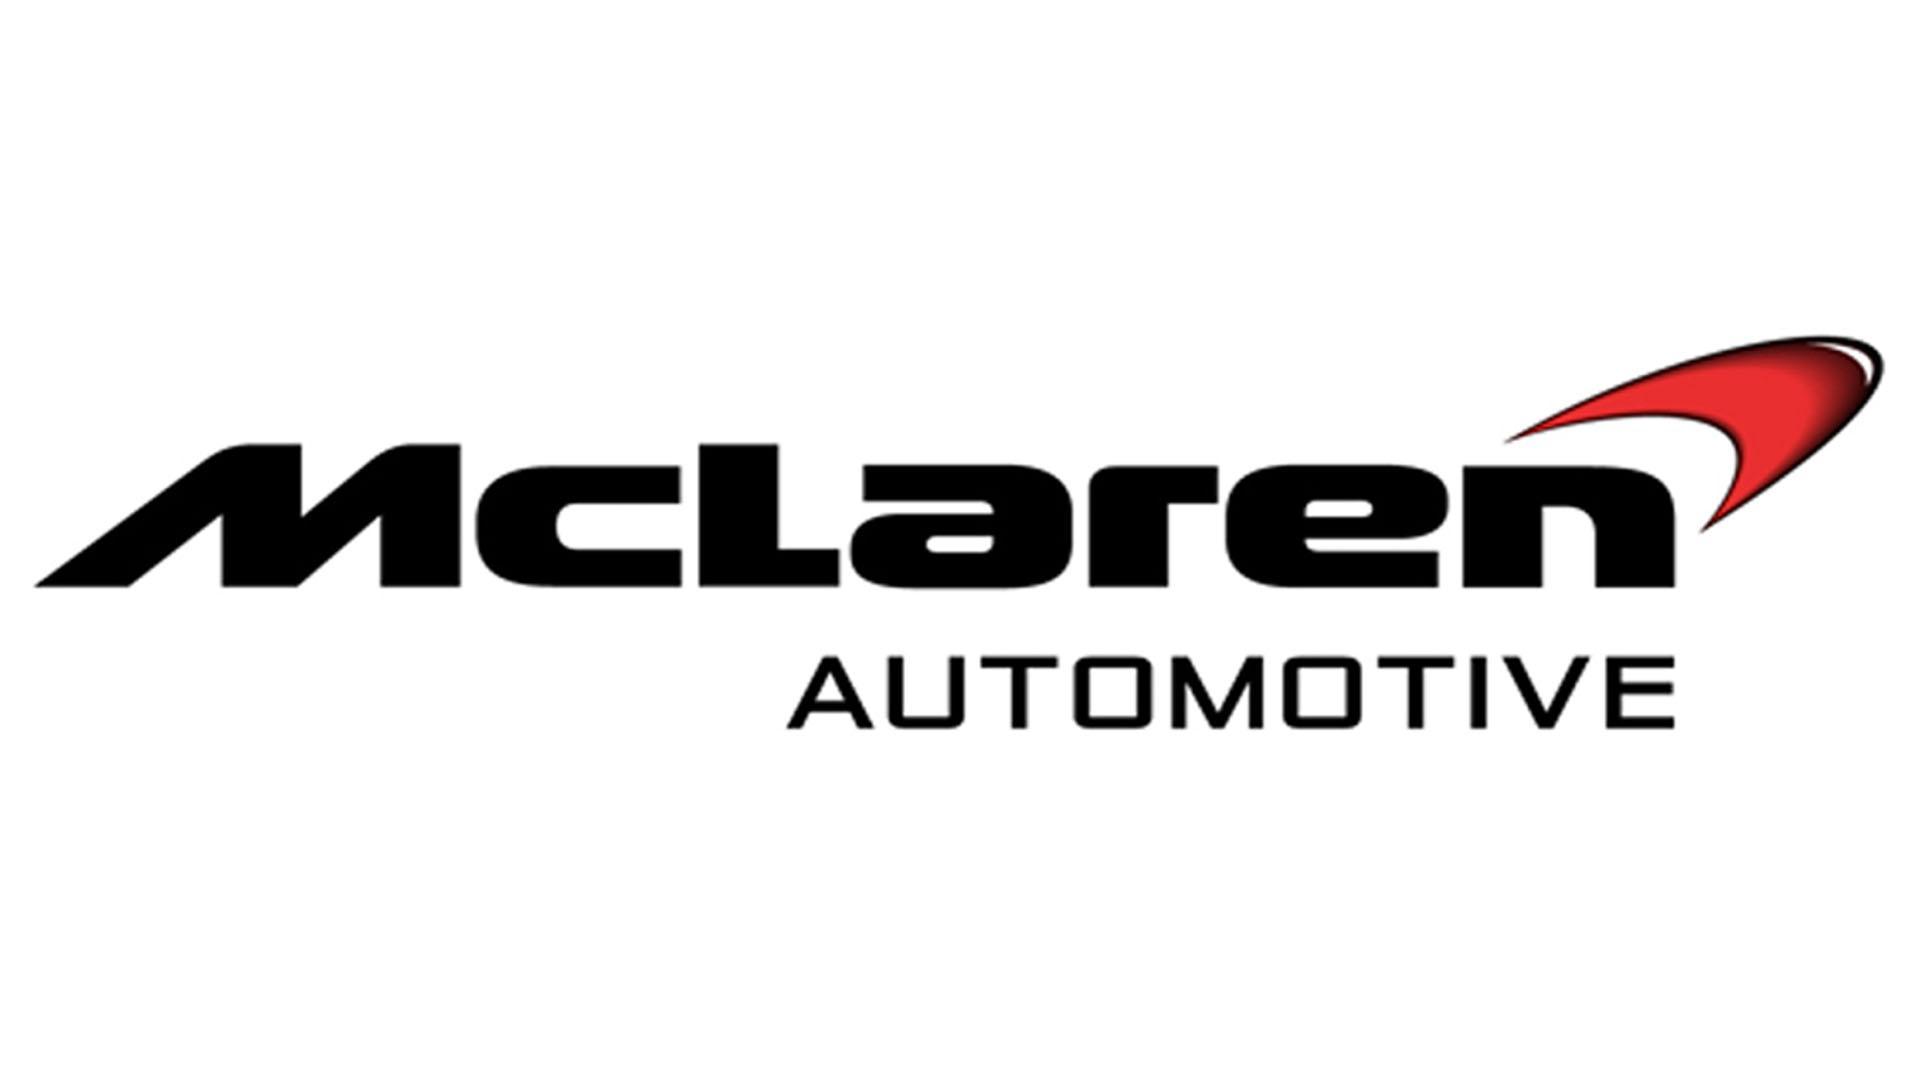 mclaren logo meaning and history  mclaren symbol